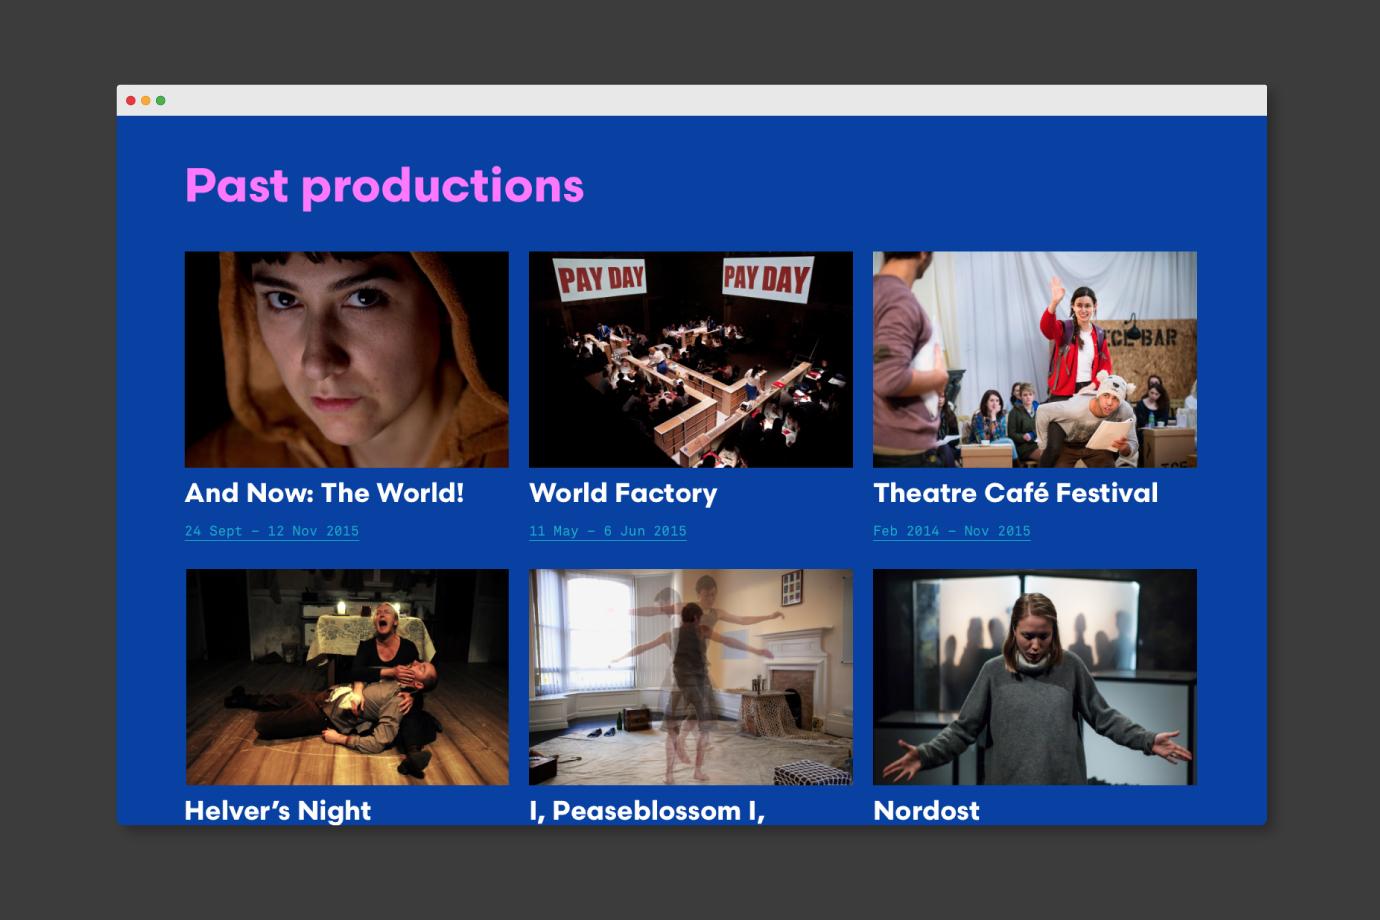 http://spystudio.co.uk/wp-content/uploads/2017/04/Boundless_Theatre_web-2.jpg